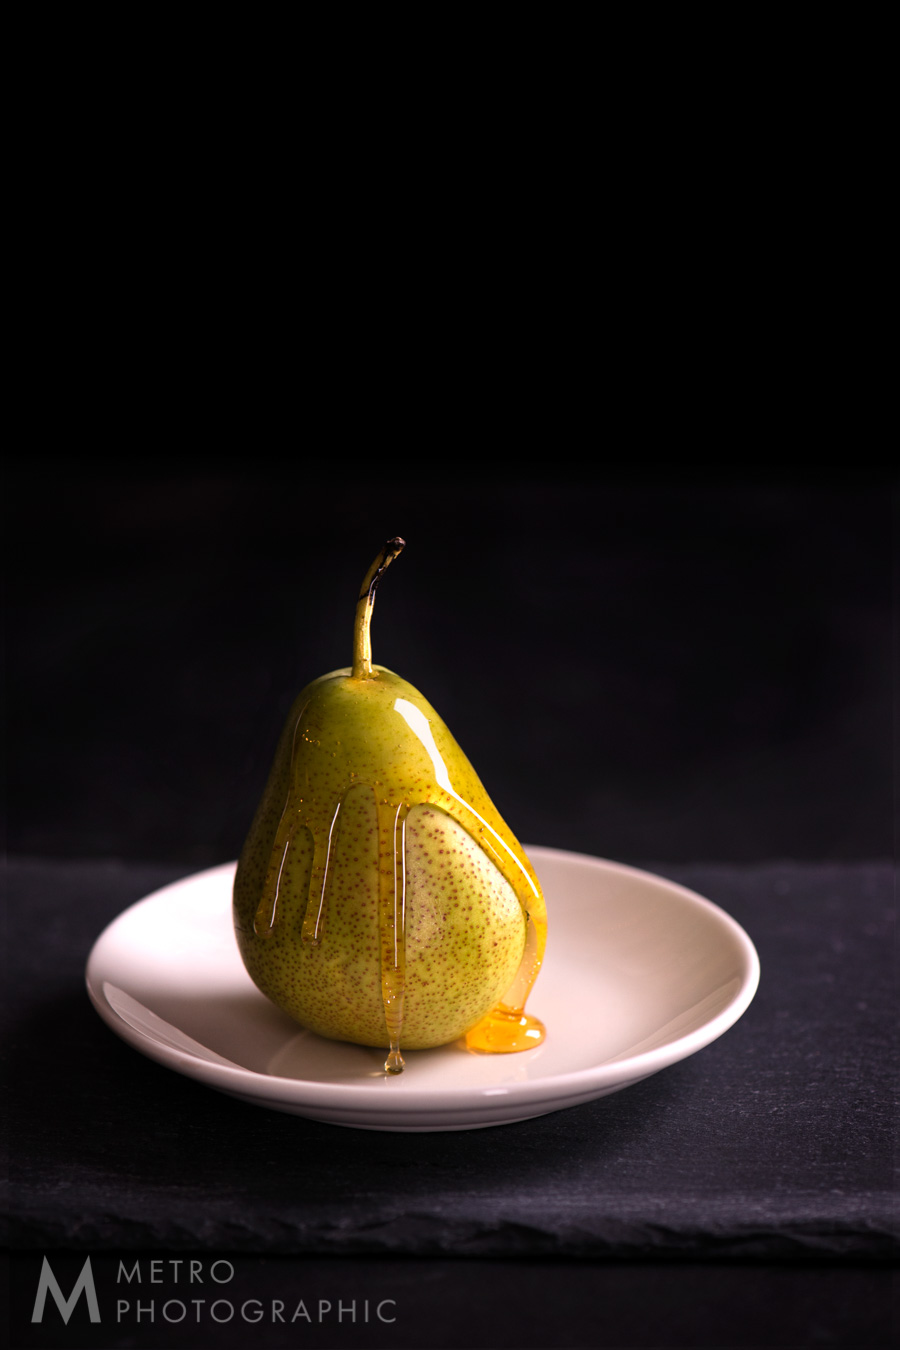 MK_Klementowski - Pear.jpg